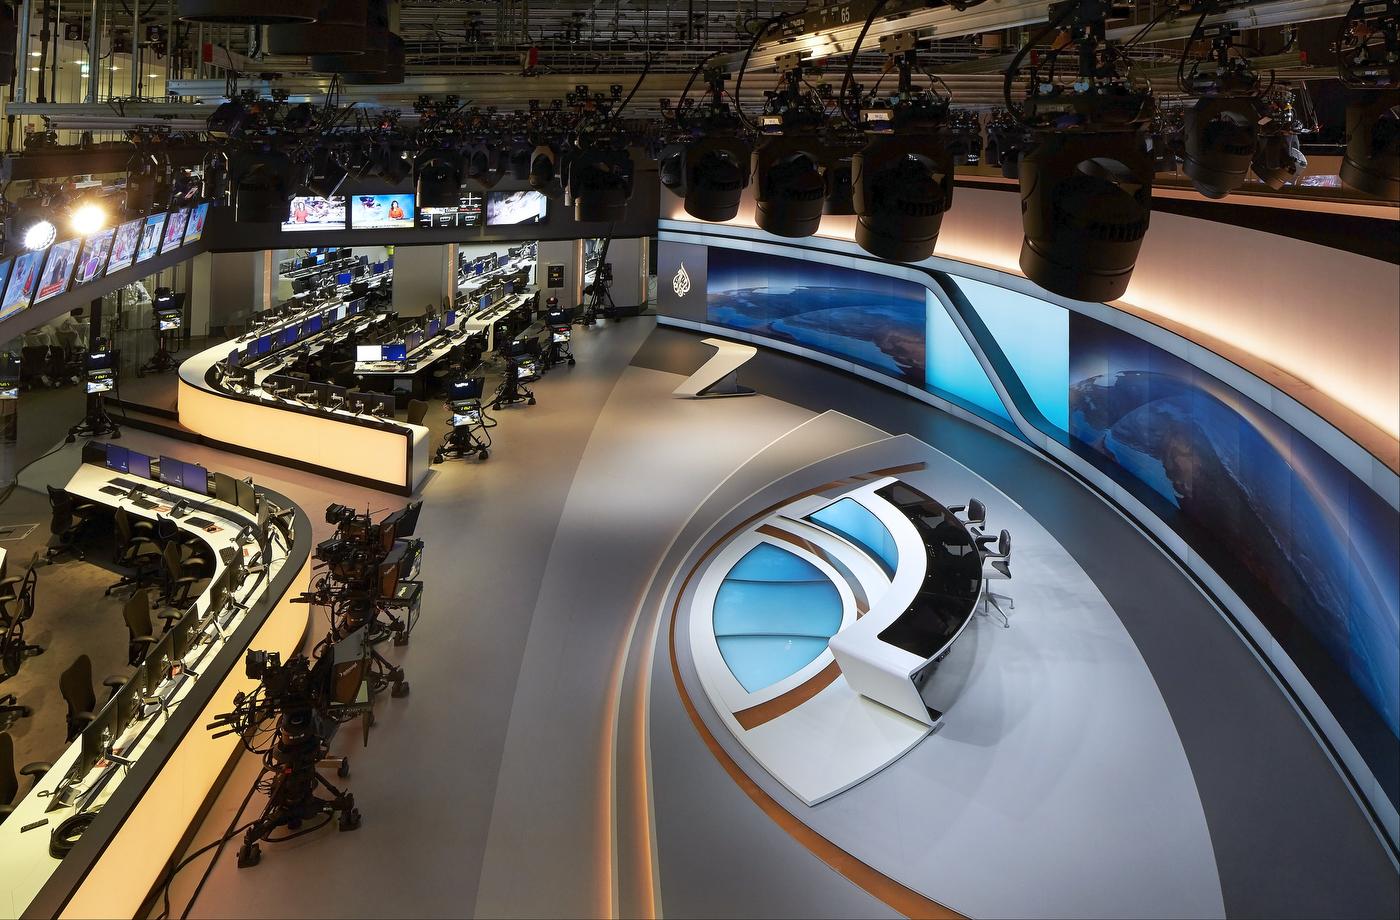 NCS_Al-Jazeera-Newsroom-Studio-5_0008